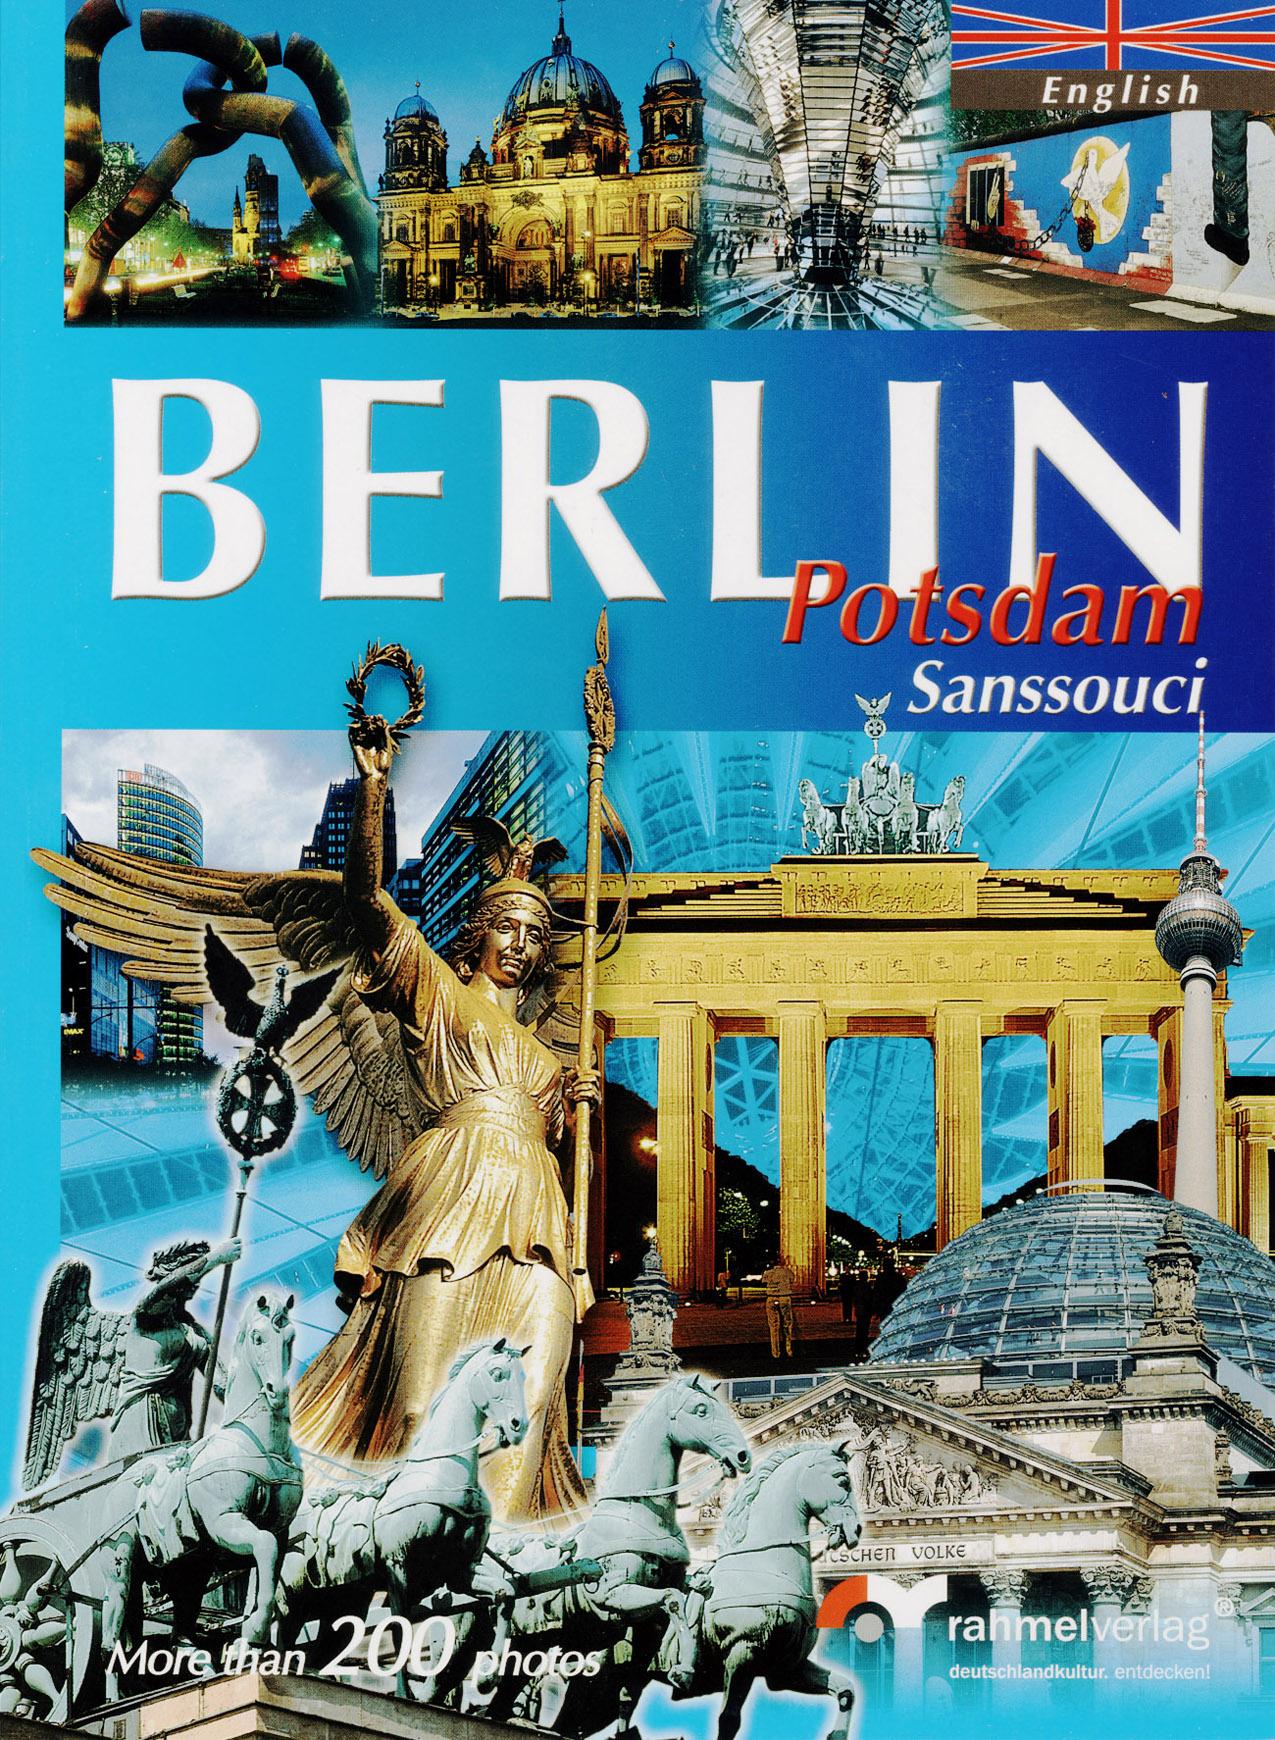 XXL-Book Berlin (englische Ausgabe) - Potsdam S...